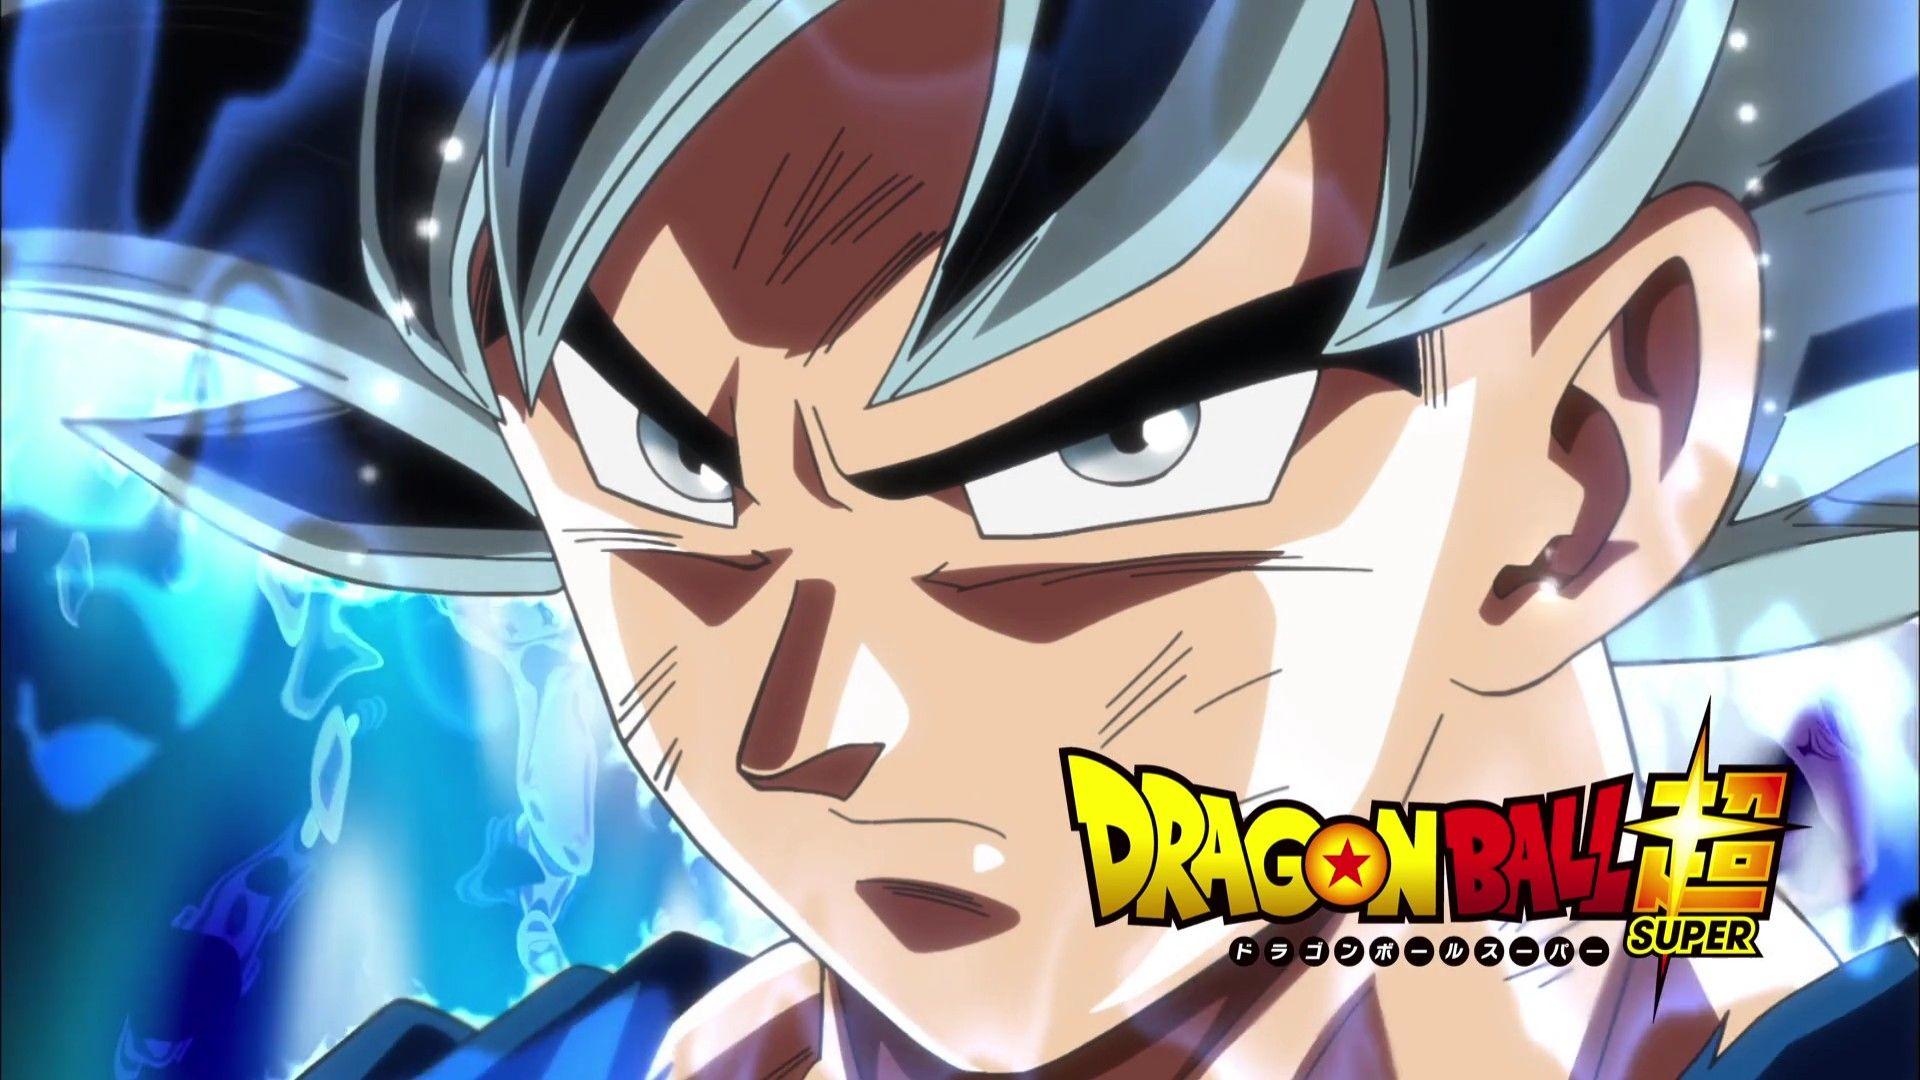 Luxury Goku Ps4 Wallpaper Dragon Ball Super Dragon Ball Goku